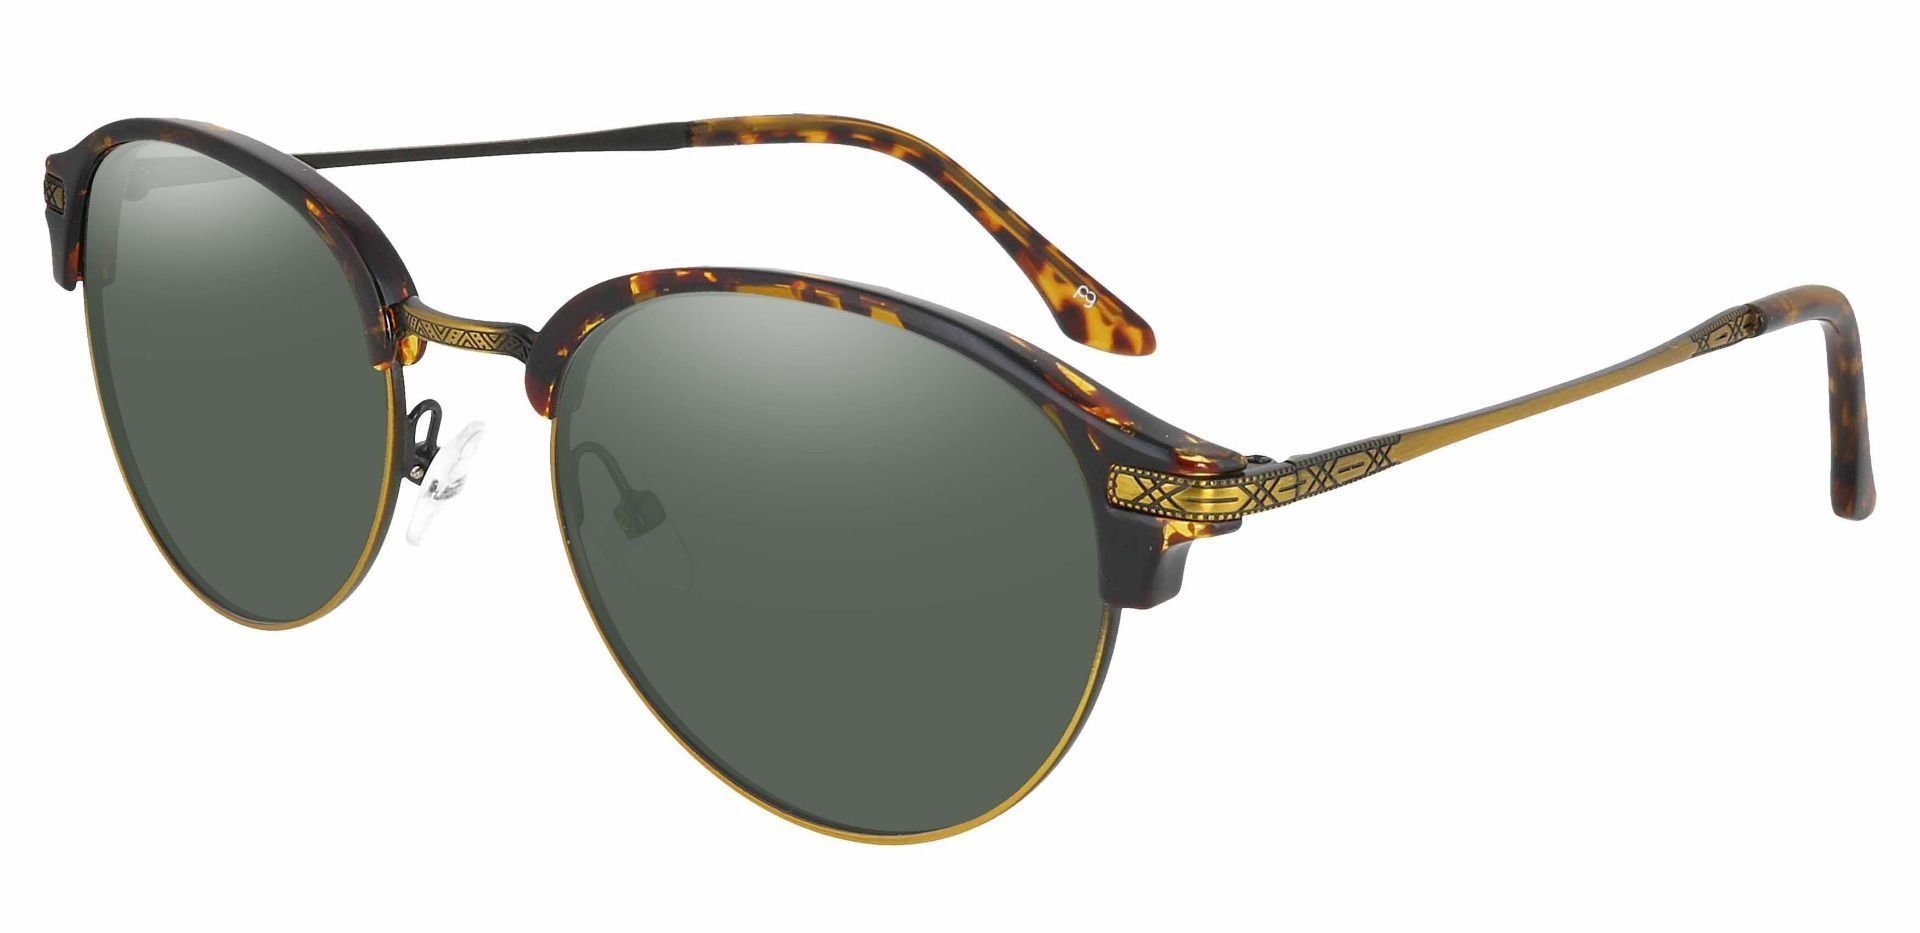 Akron Browline Progressive Sunglasses - Tortoise Frame With Green Lenses